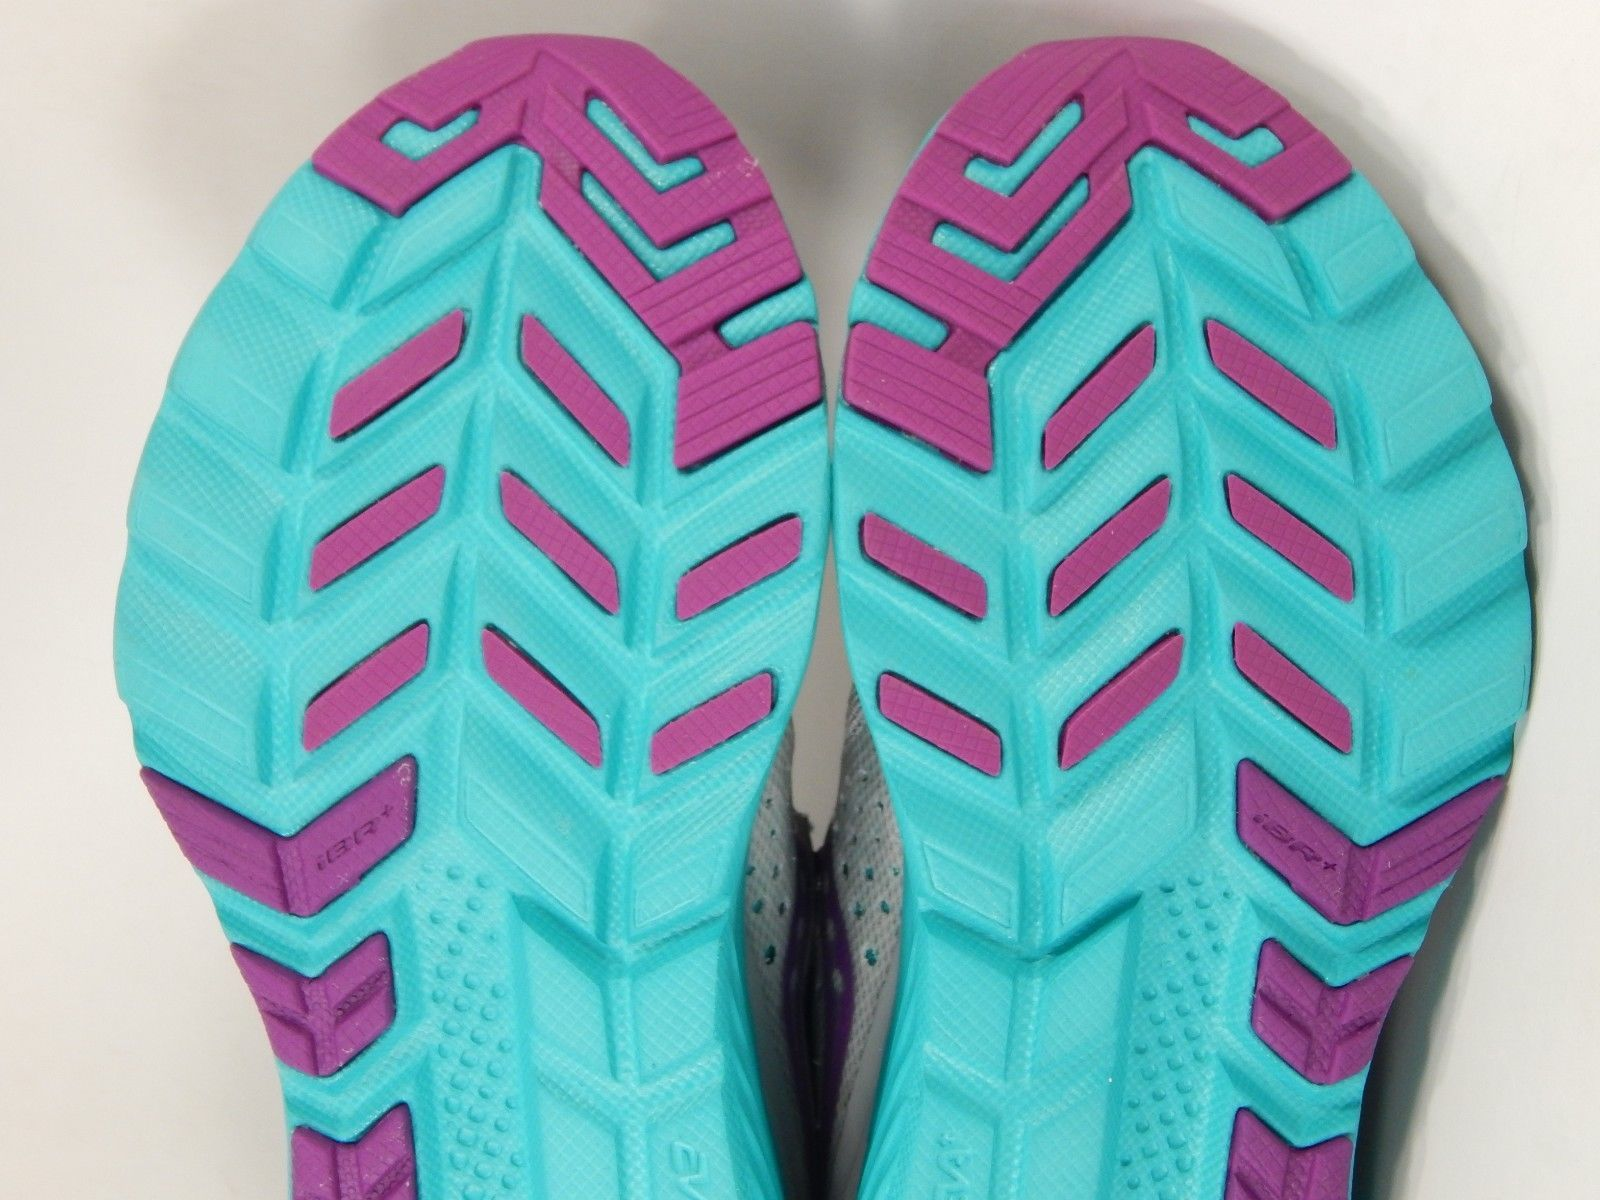 Saucony Kinvara 8 Size 6 M (B) EU 37 Women's Running Shoes Gray Purple S10356-3